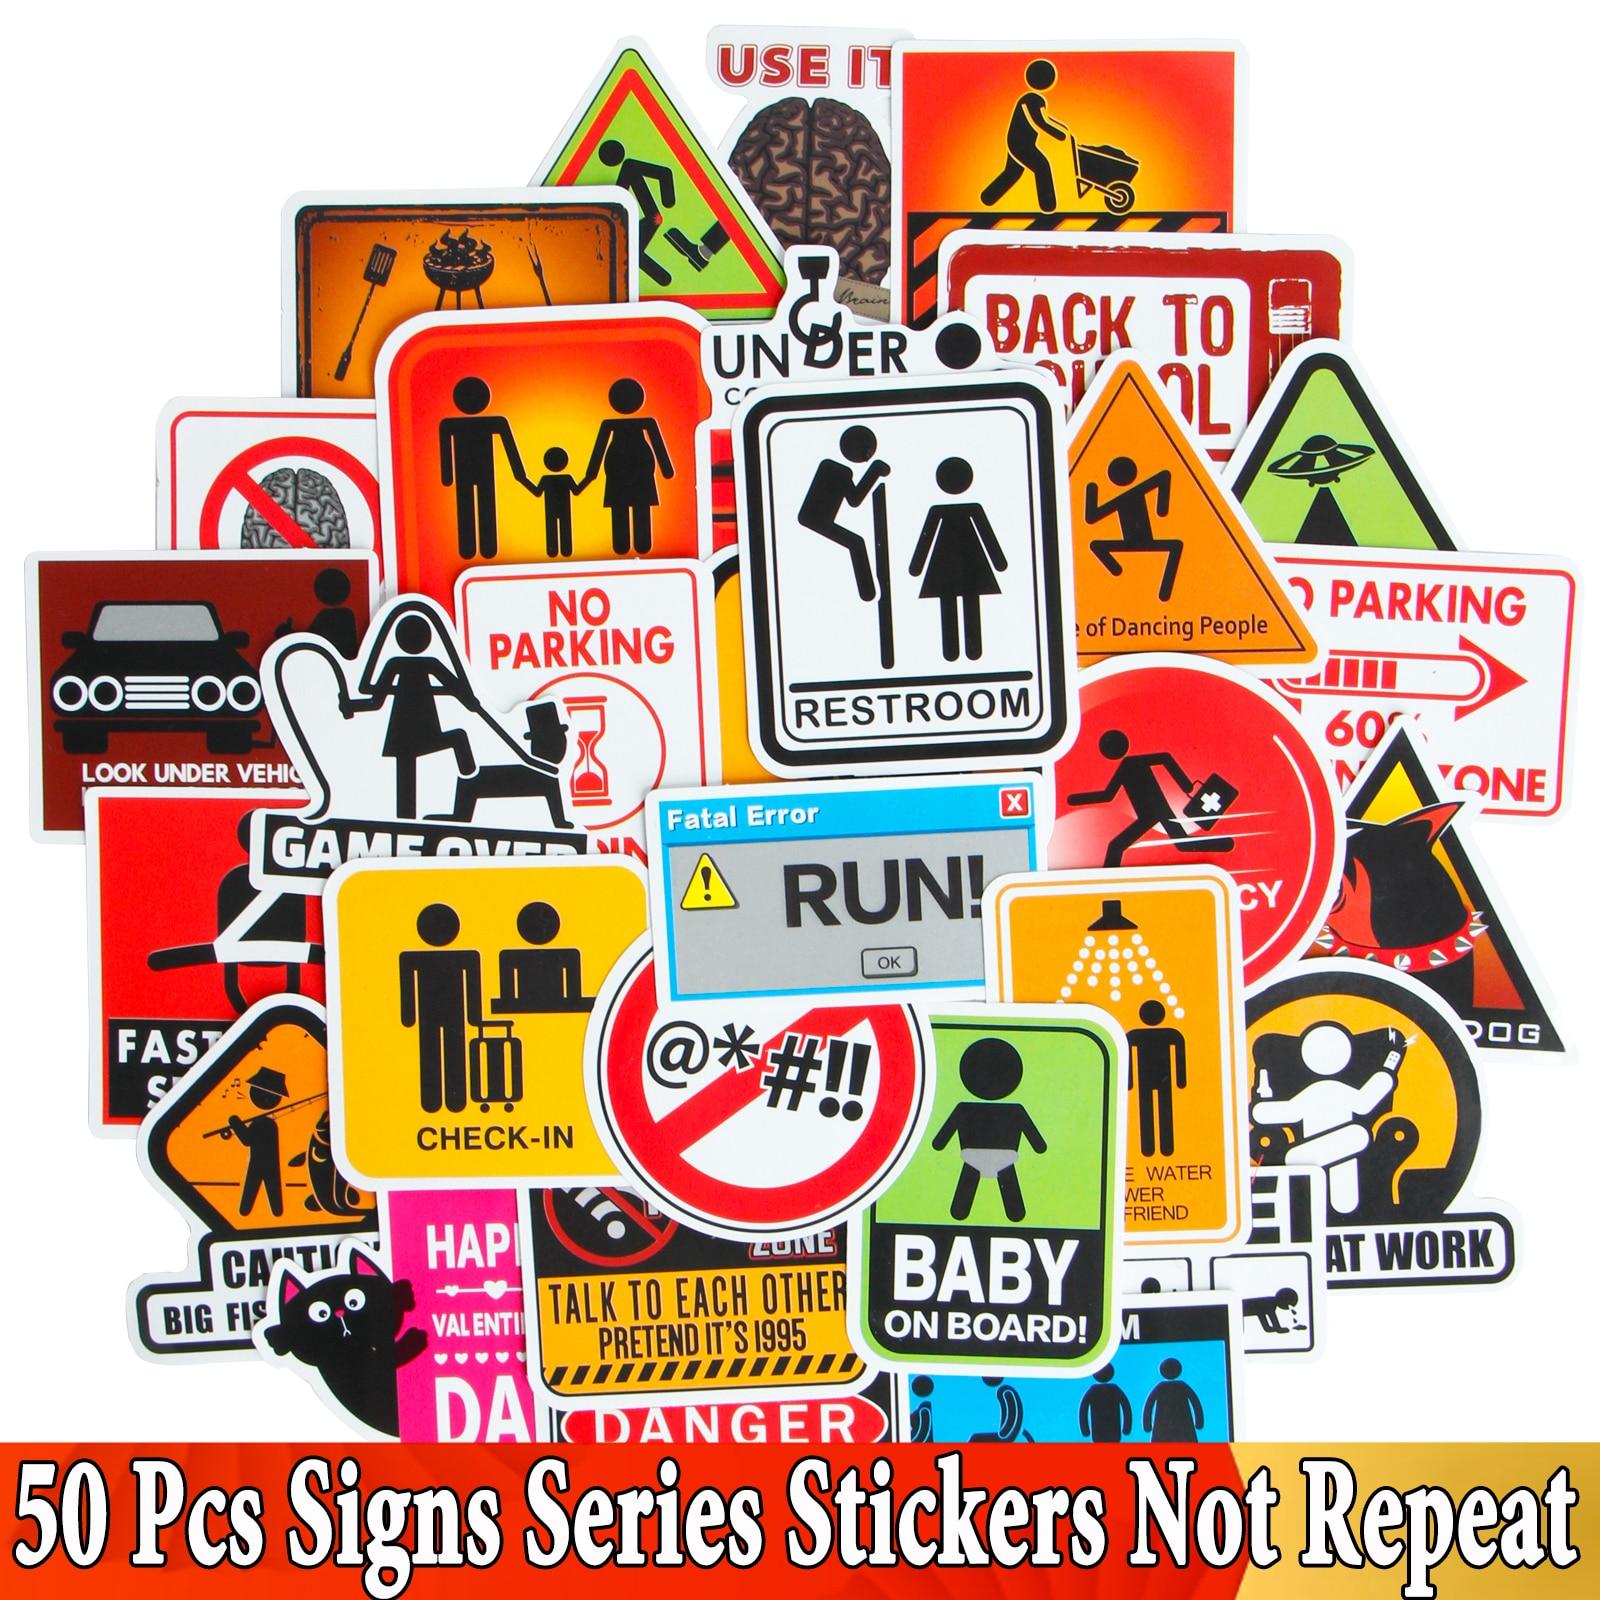 50 Pcs JDM Warning Road Reminder Danger Banning Signs Stickers For Car Laptop Motorcycle Luggage Bicycle Snowboard Sticker Toys